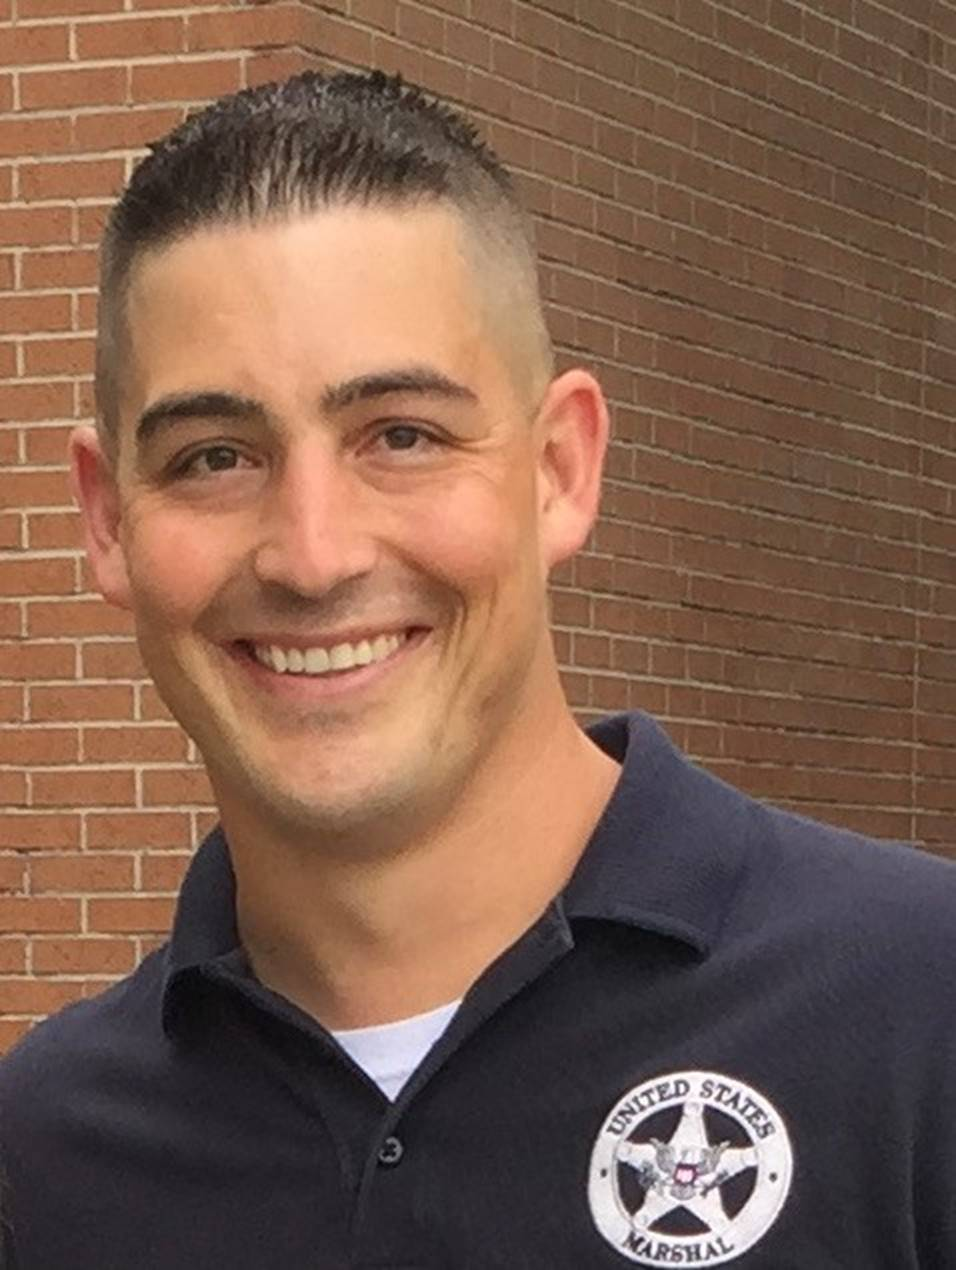 Senior Inspector Jared Keyworth   United States Department of Justice - United States Marshals Service, U.S. Government